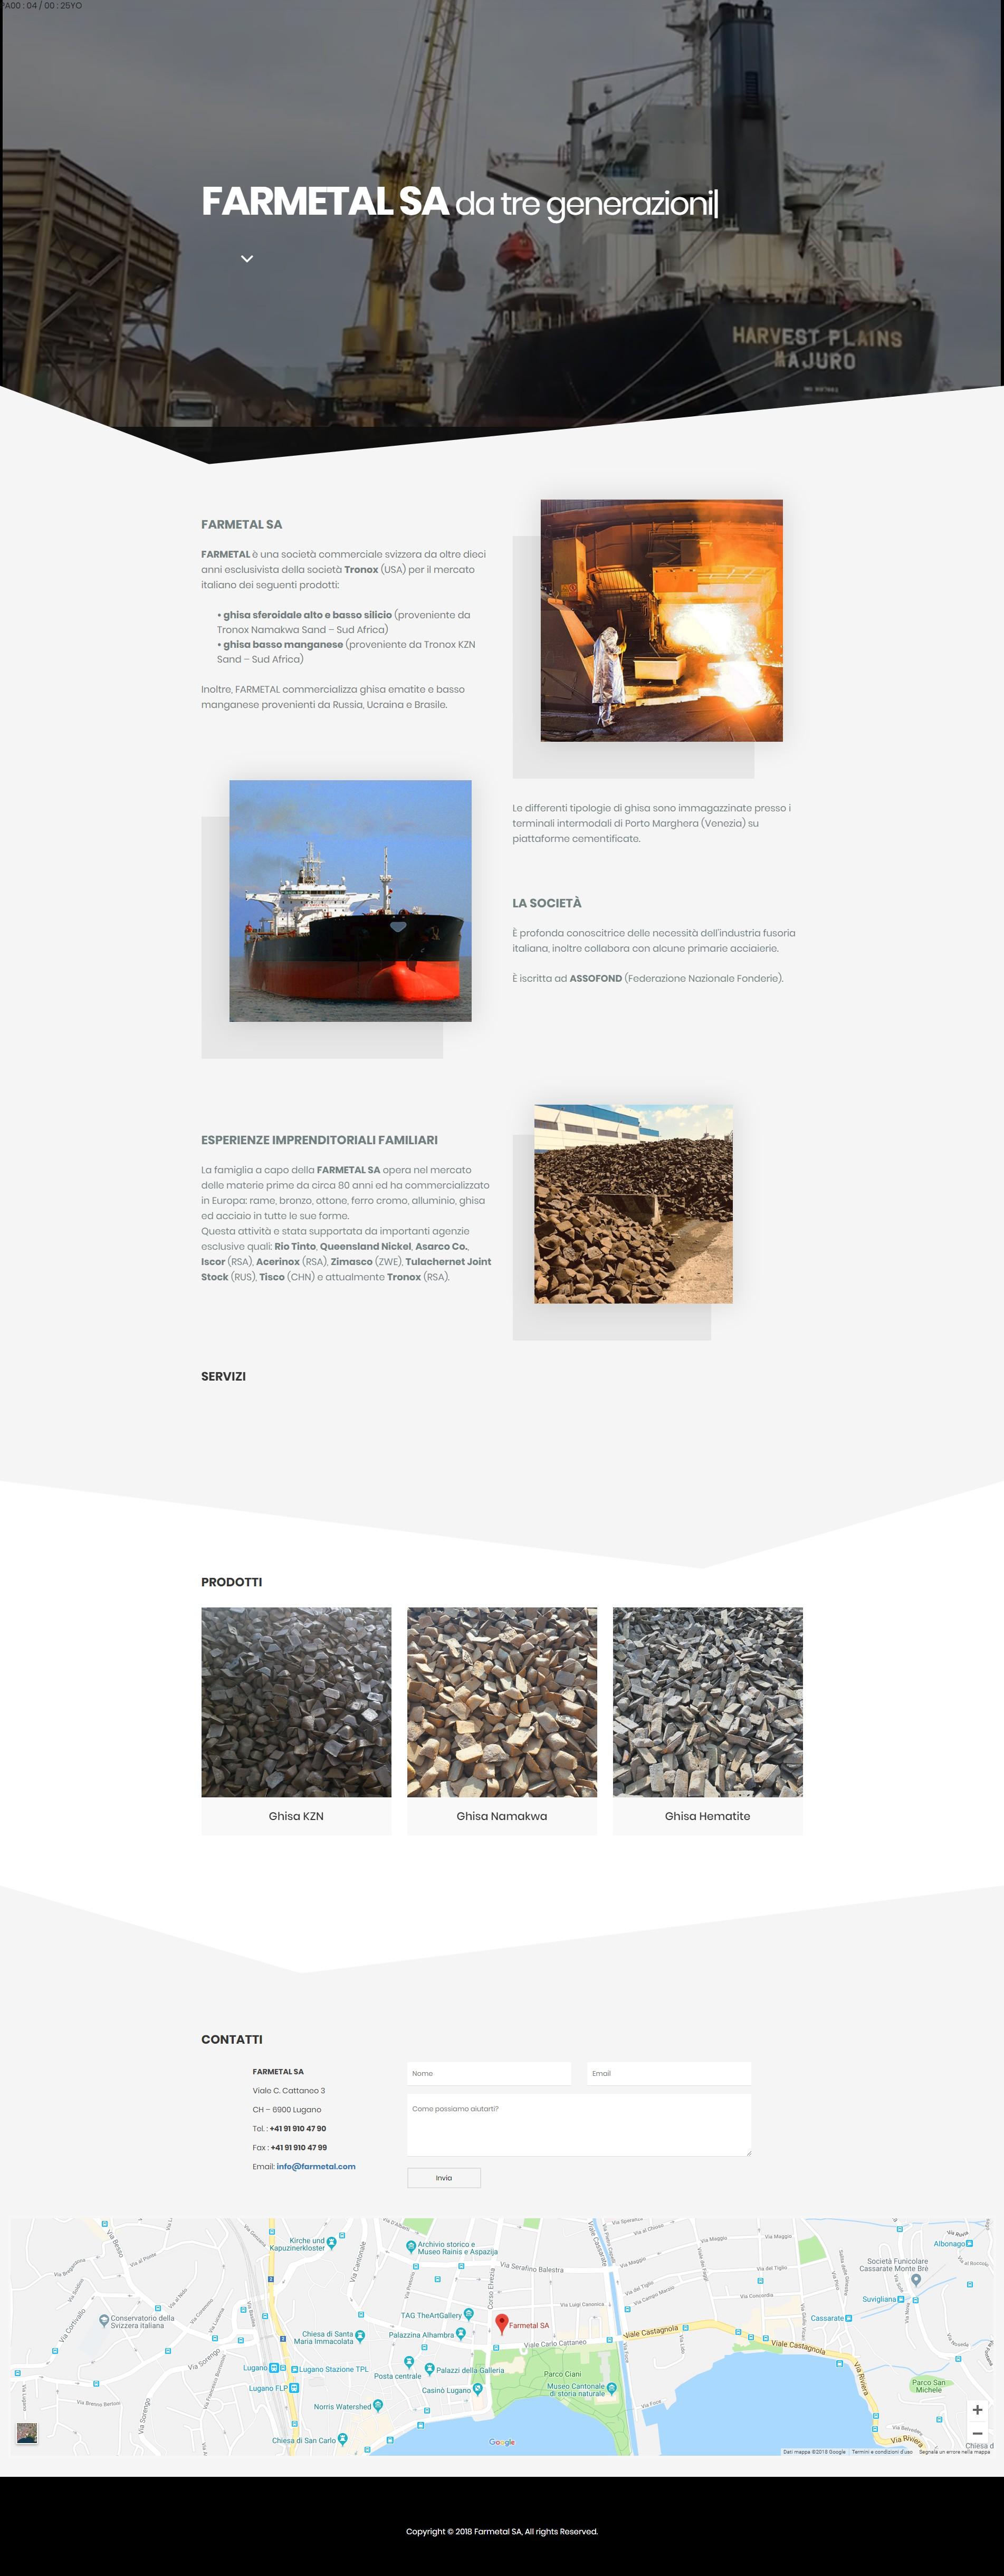 FARMETAL SA – Materie prime